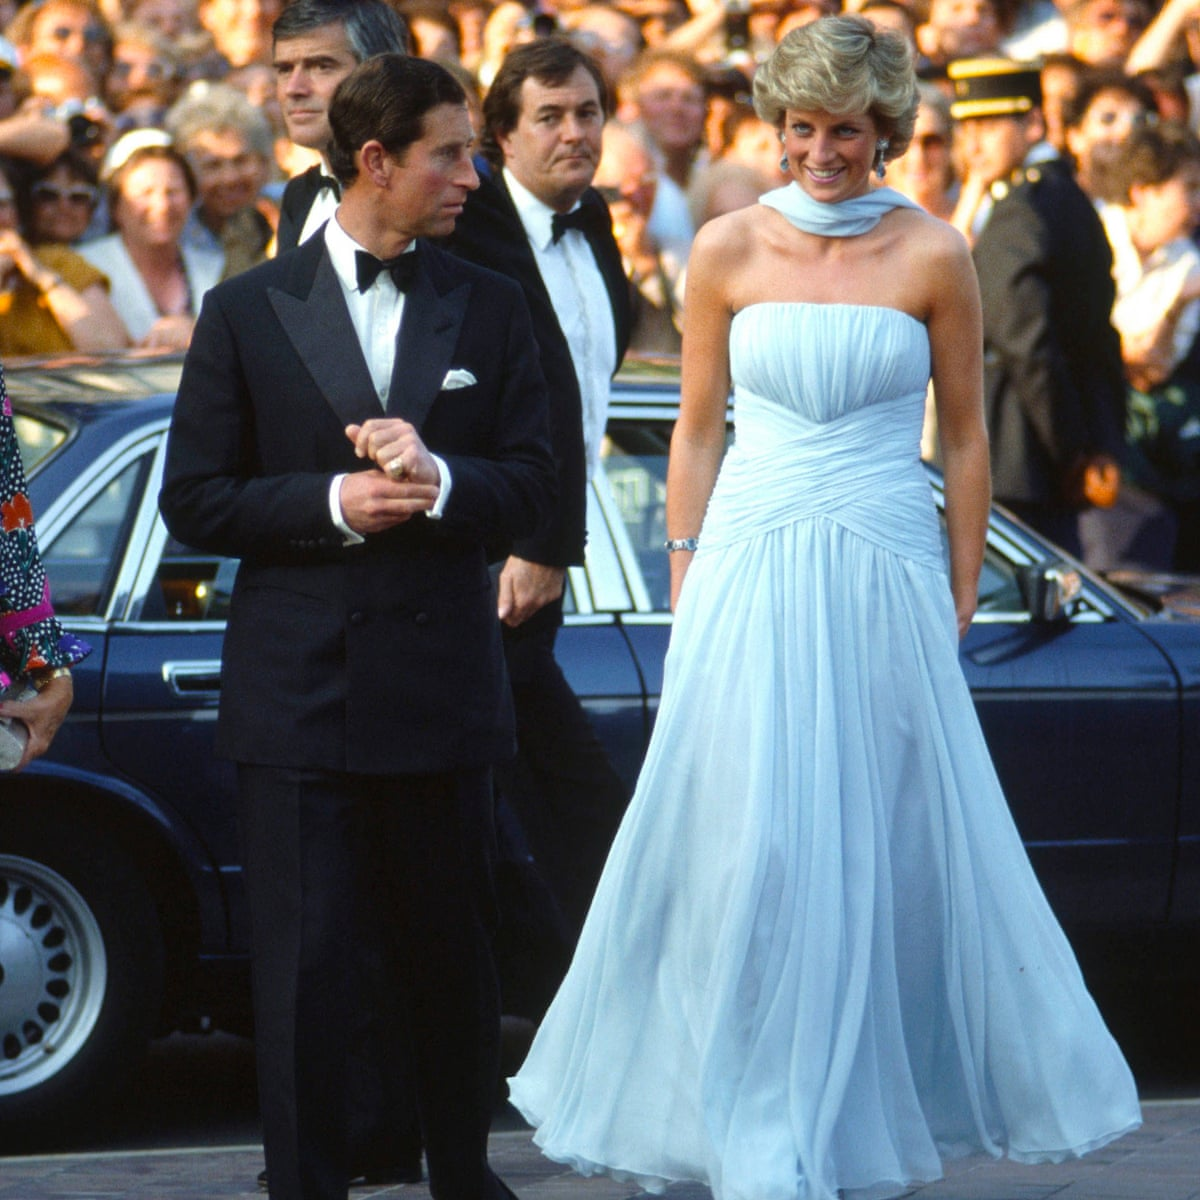 Princess Diana's fashion legacy to be celebrated at Kensington Palace | Diana, Princess of Wales | The Guardian